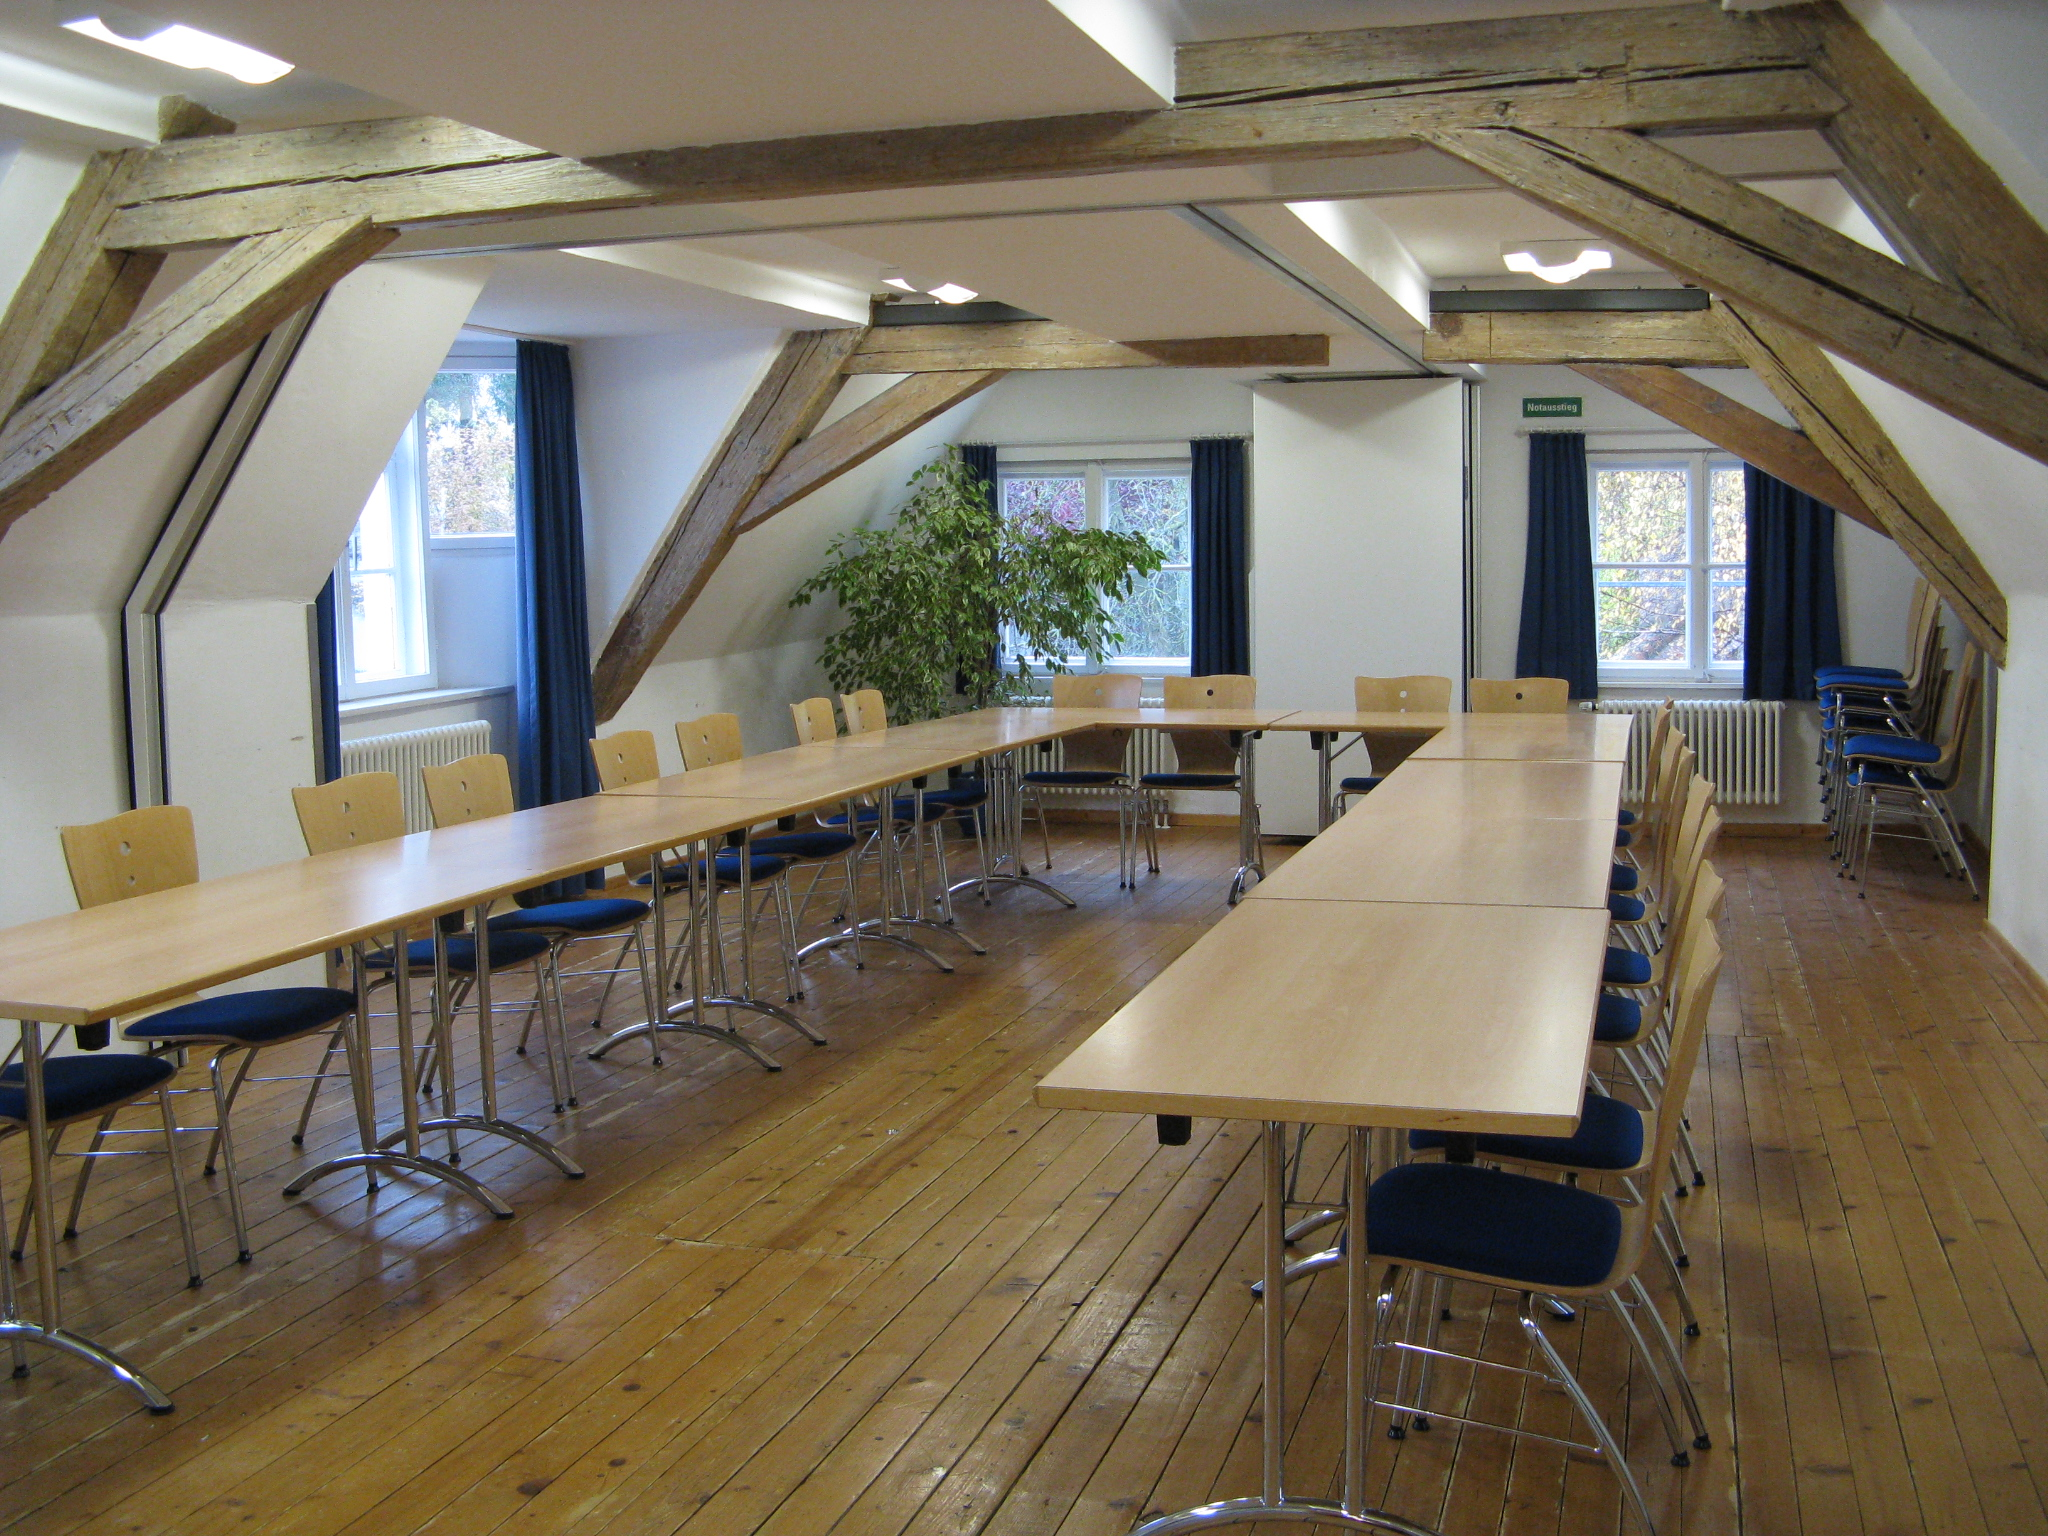 JTH - Seminarraum groß